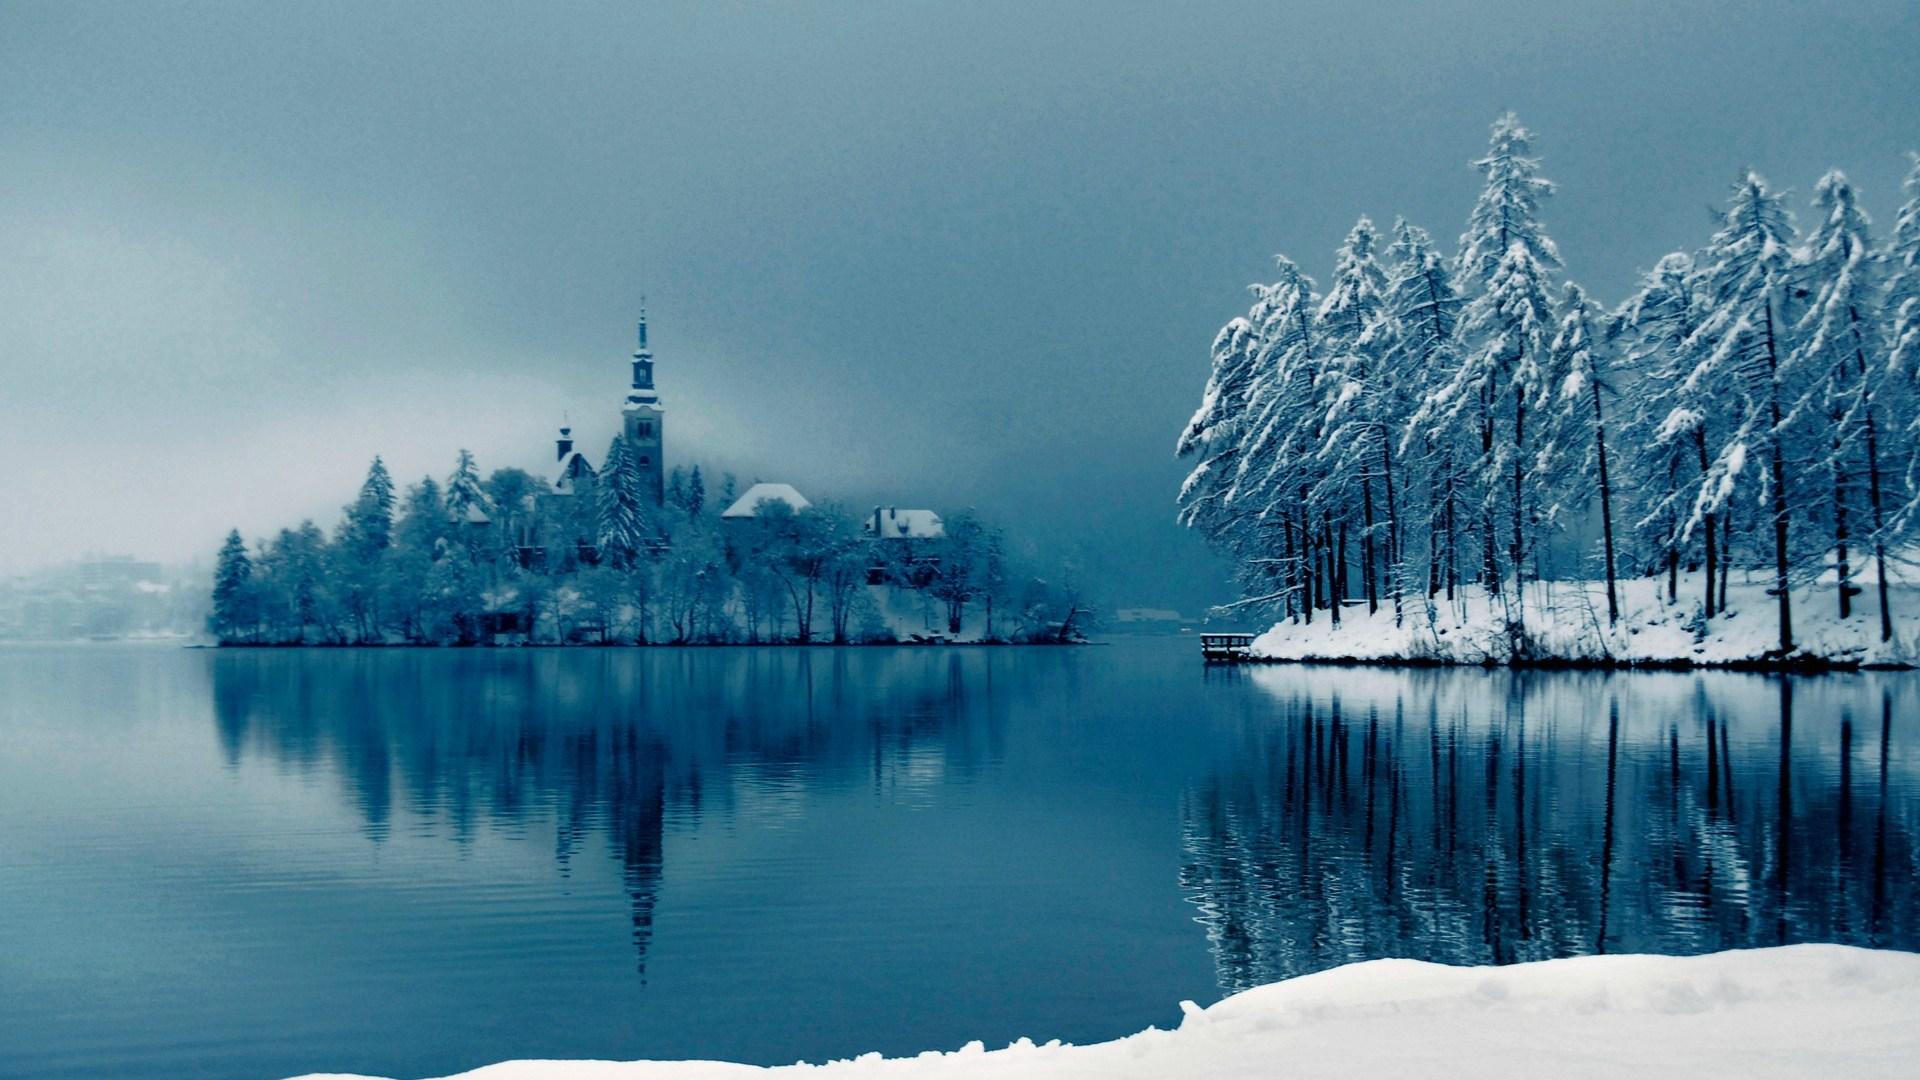 Popular Wallpaper High Quality Winter - winter_time_wallpaper_001  Collection_234224.jpg